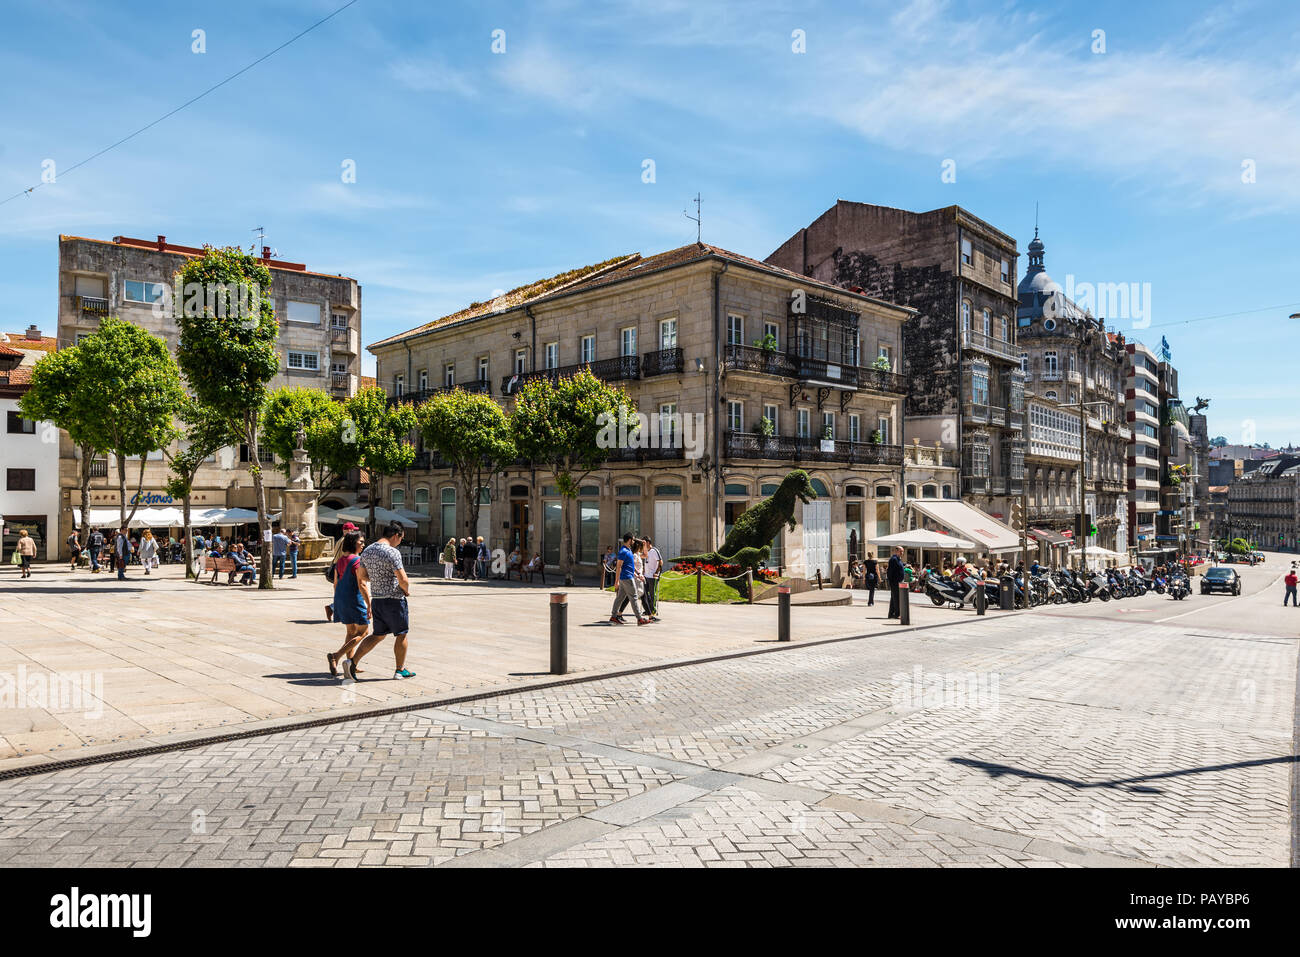 Vigo, Spain - May 20, 2017: Street Life in ancient historic spanish town Vigo in Galicia, Spain. Ordinary day in a street of Vigo. - Stock Image